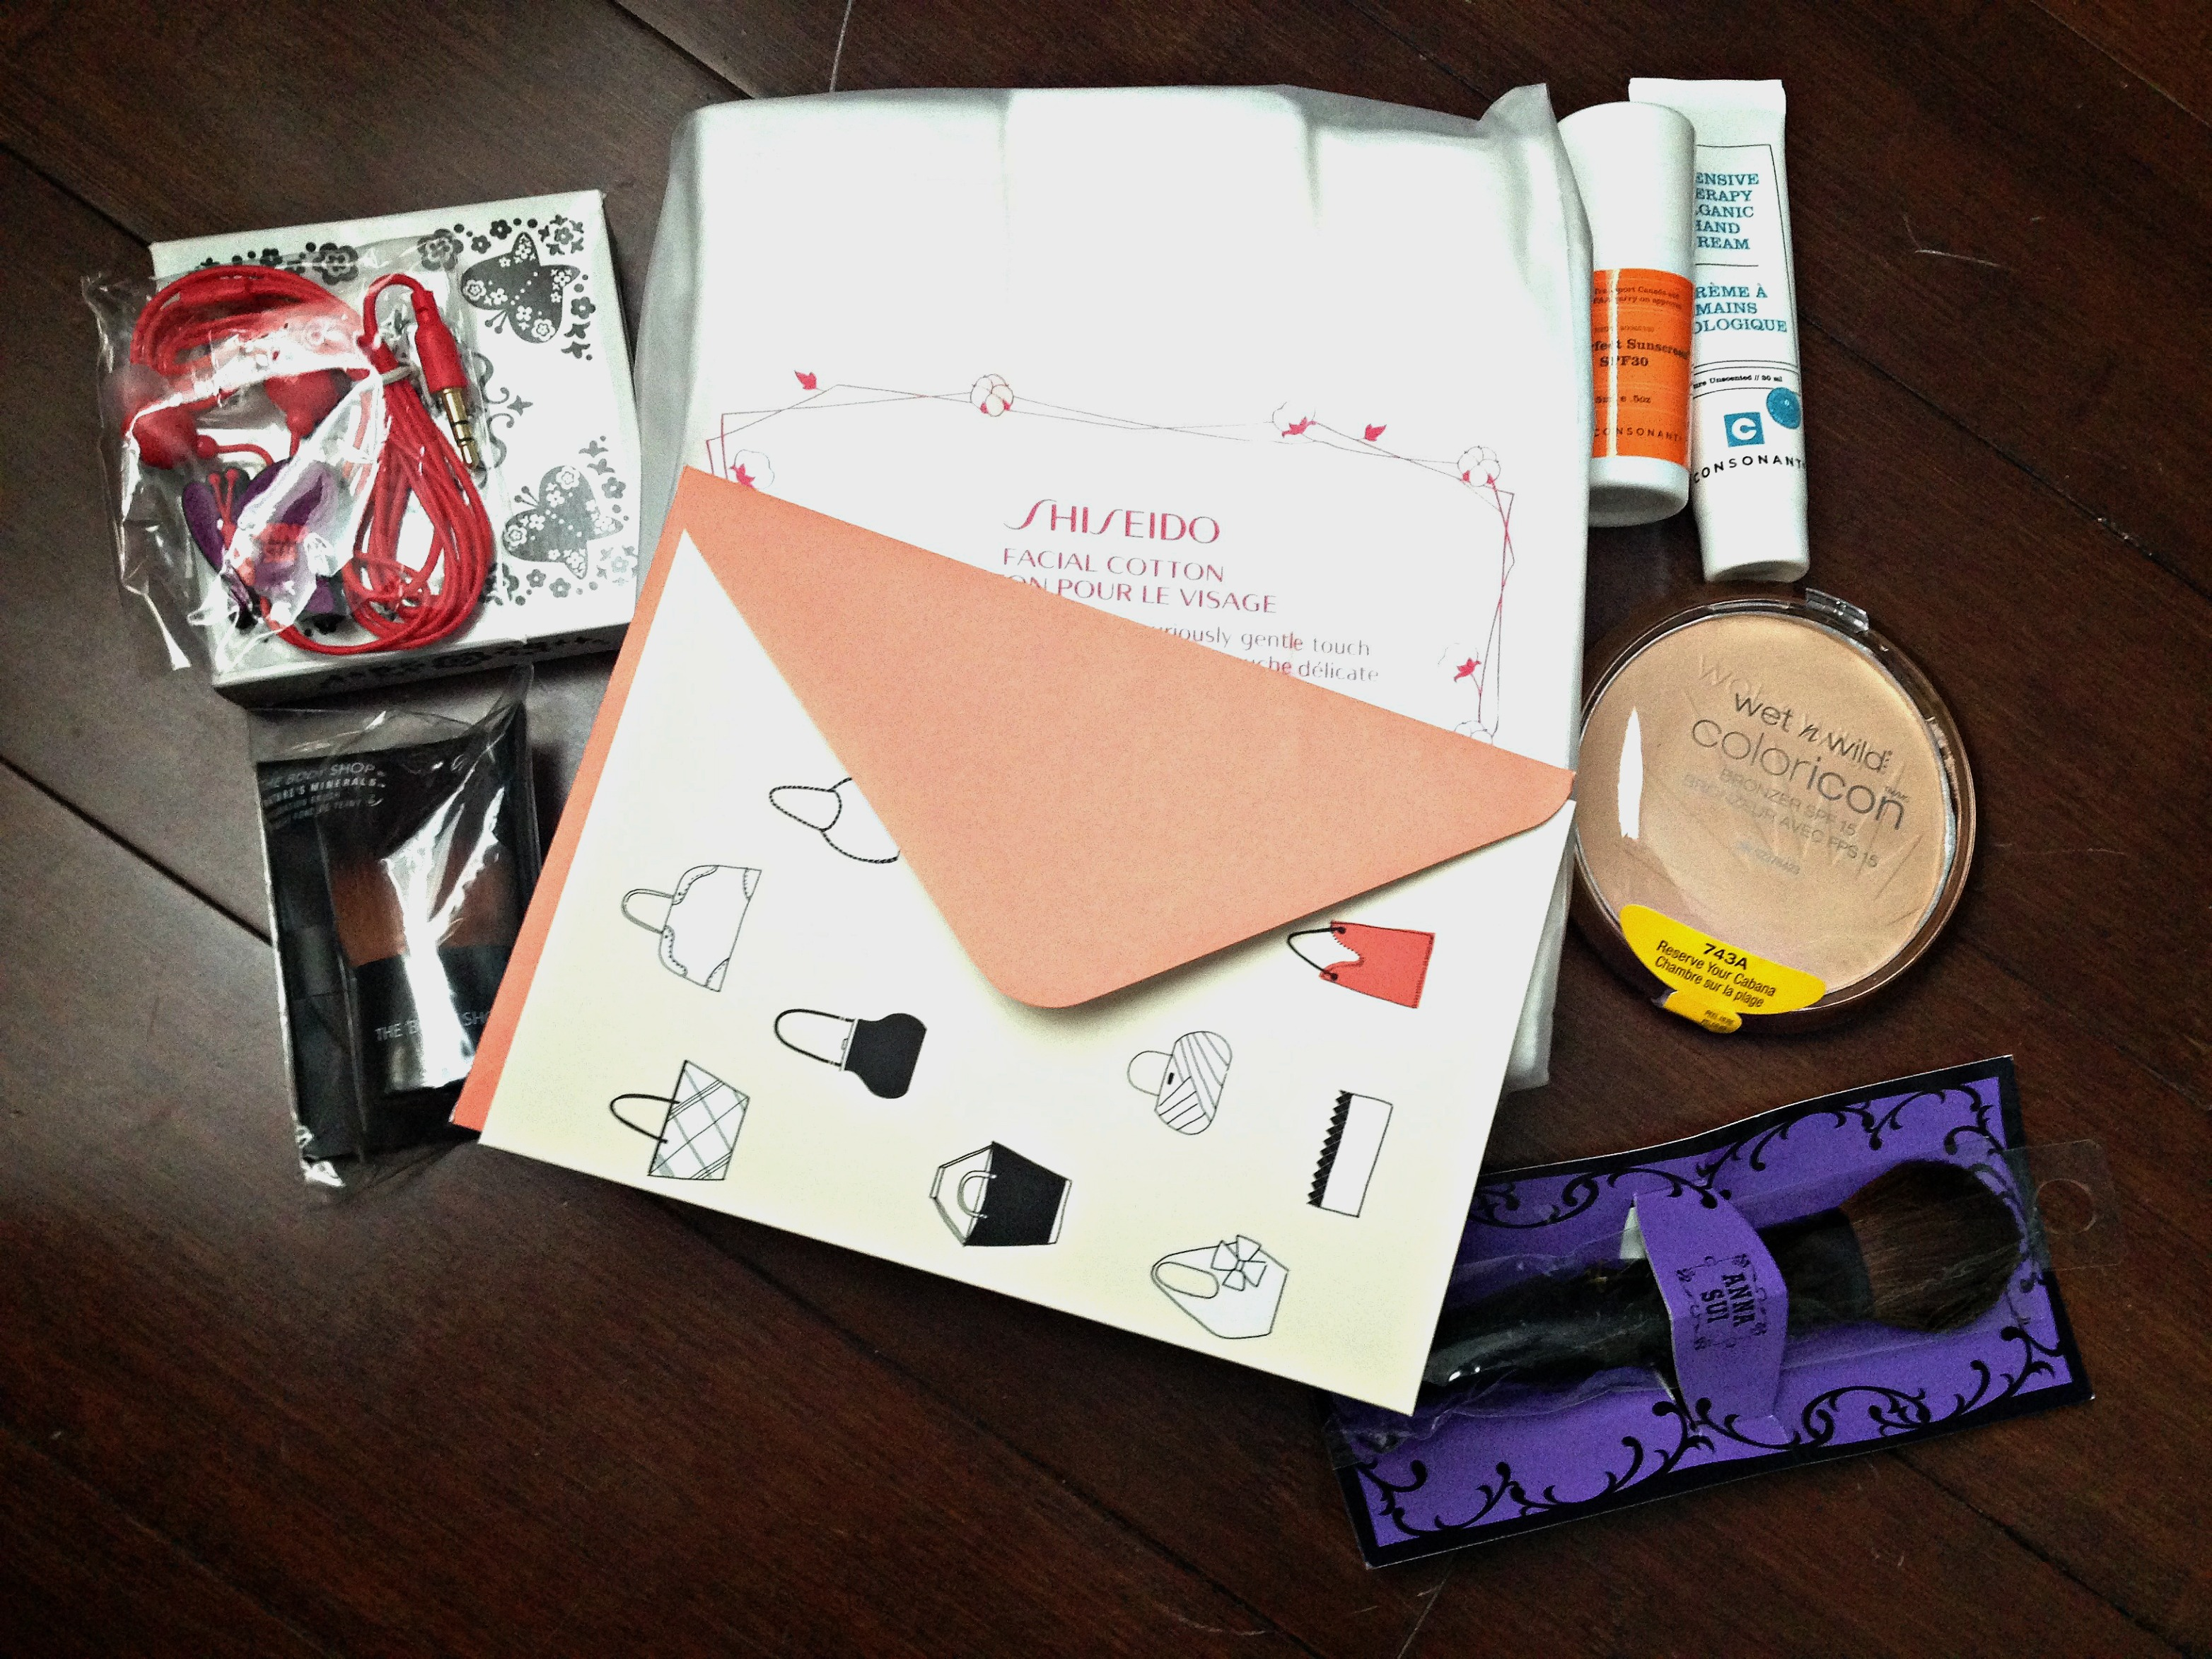 Stash Matter's Runner Up Giveaway Haulage